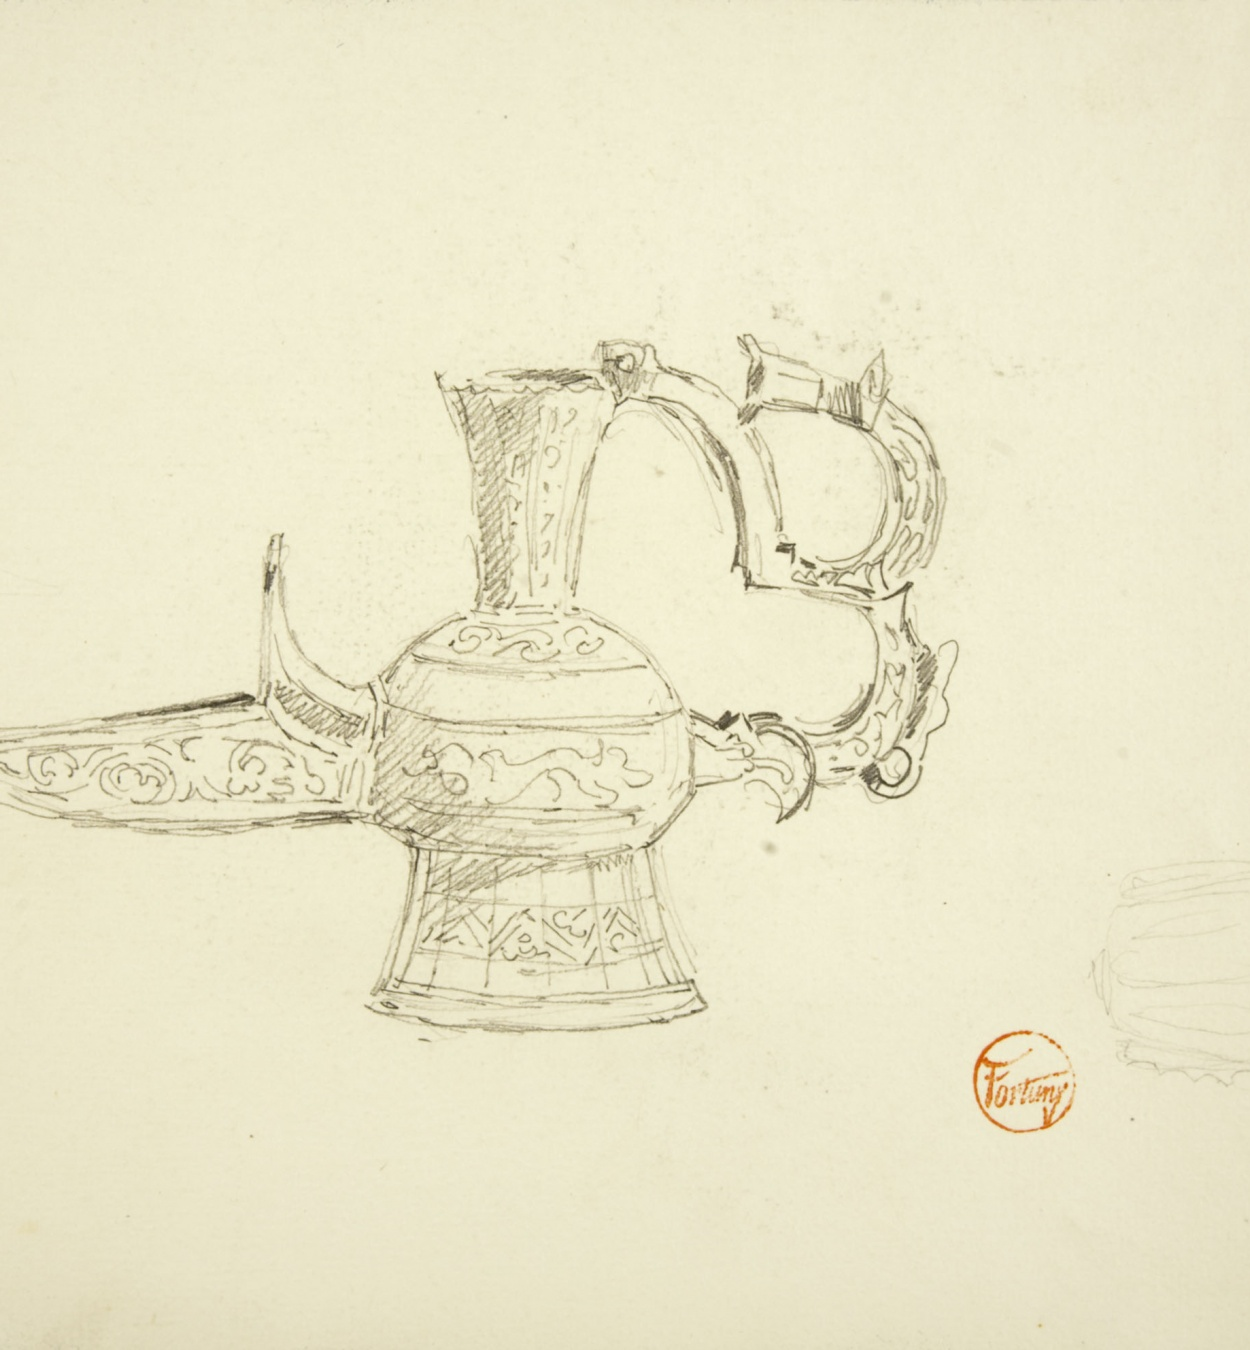 Marià Fortuny - Muslim-style lamp - Circa 1870-1872